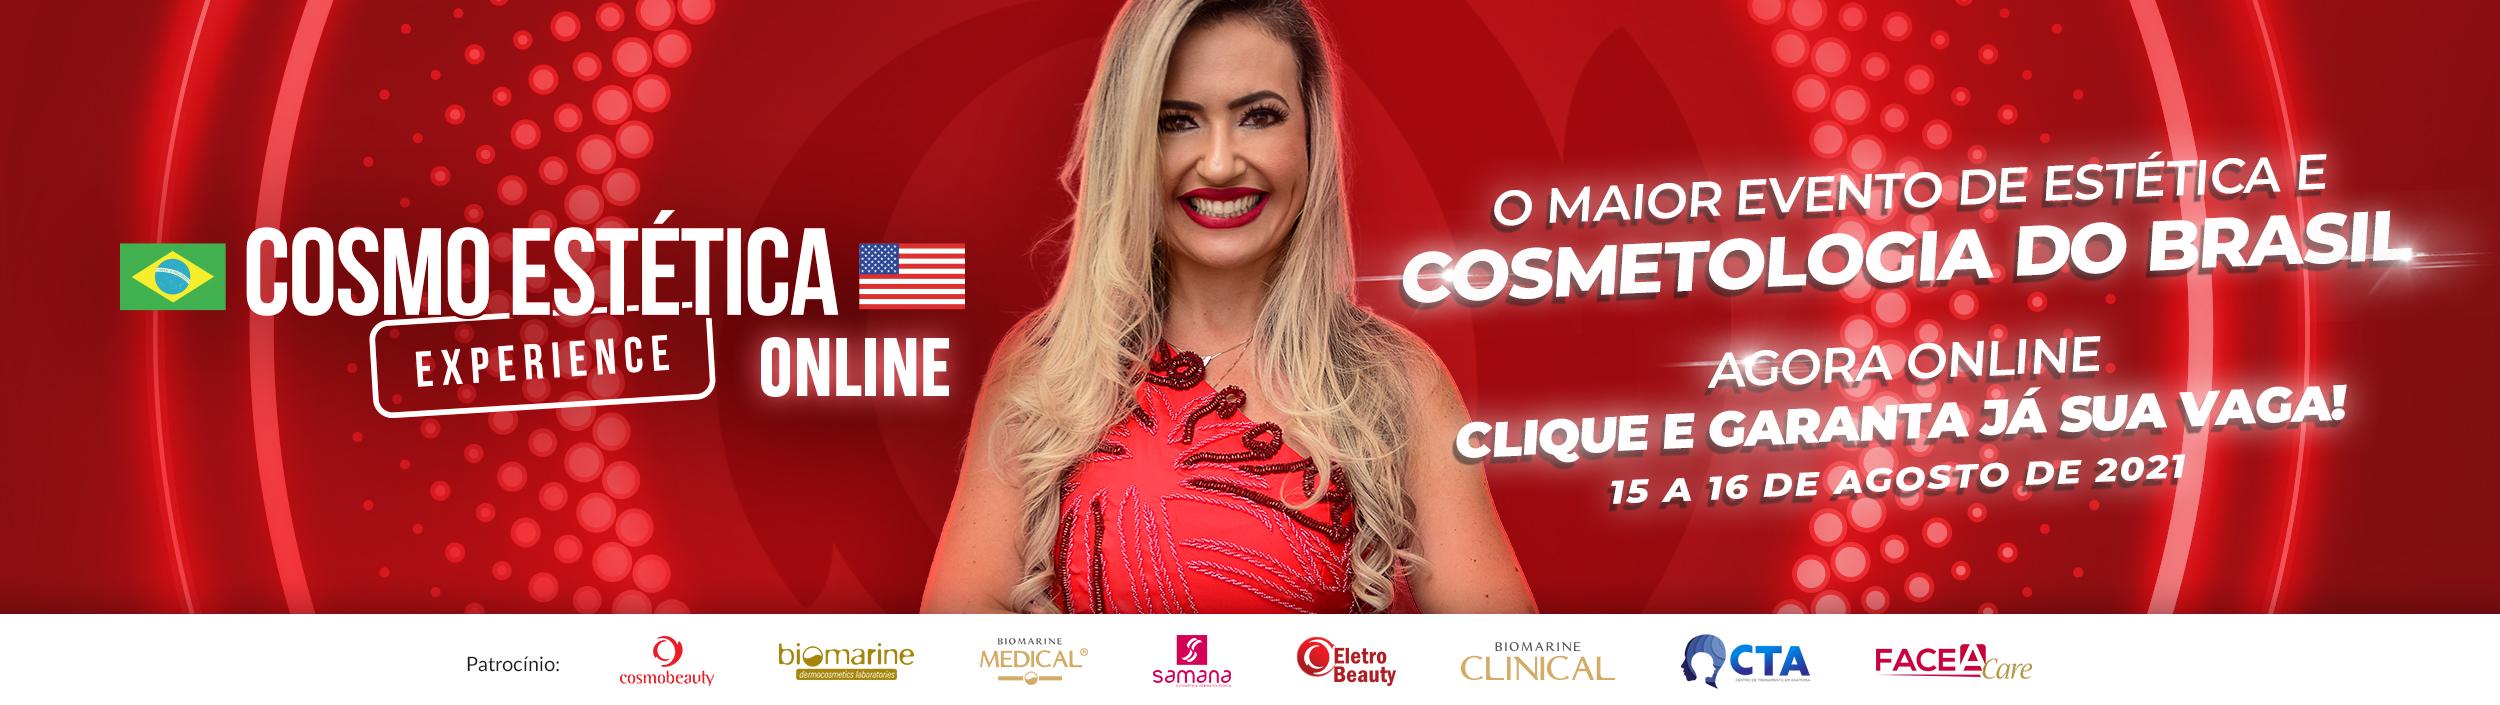 Banner-Cosmobeauty-CosmoEstetica